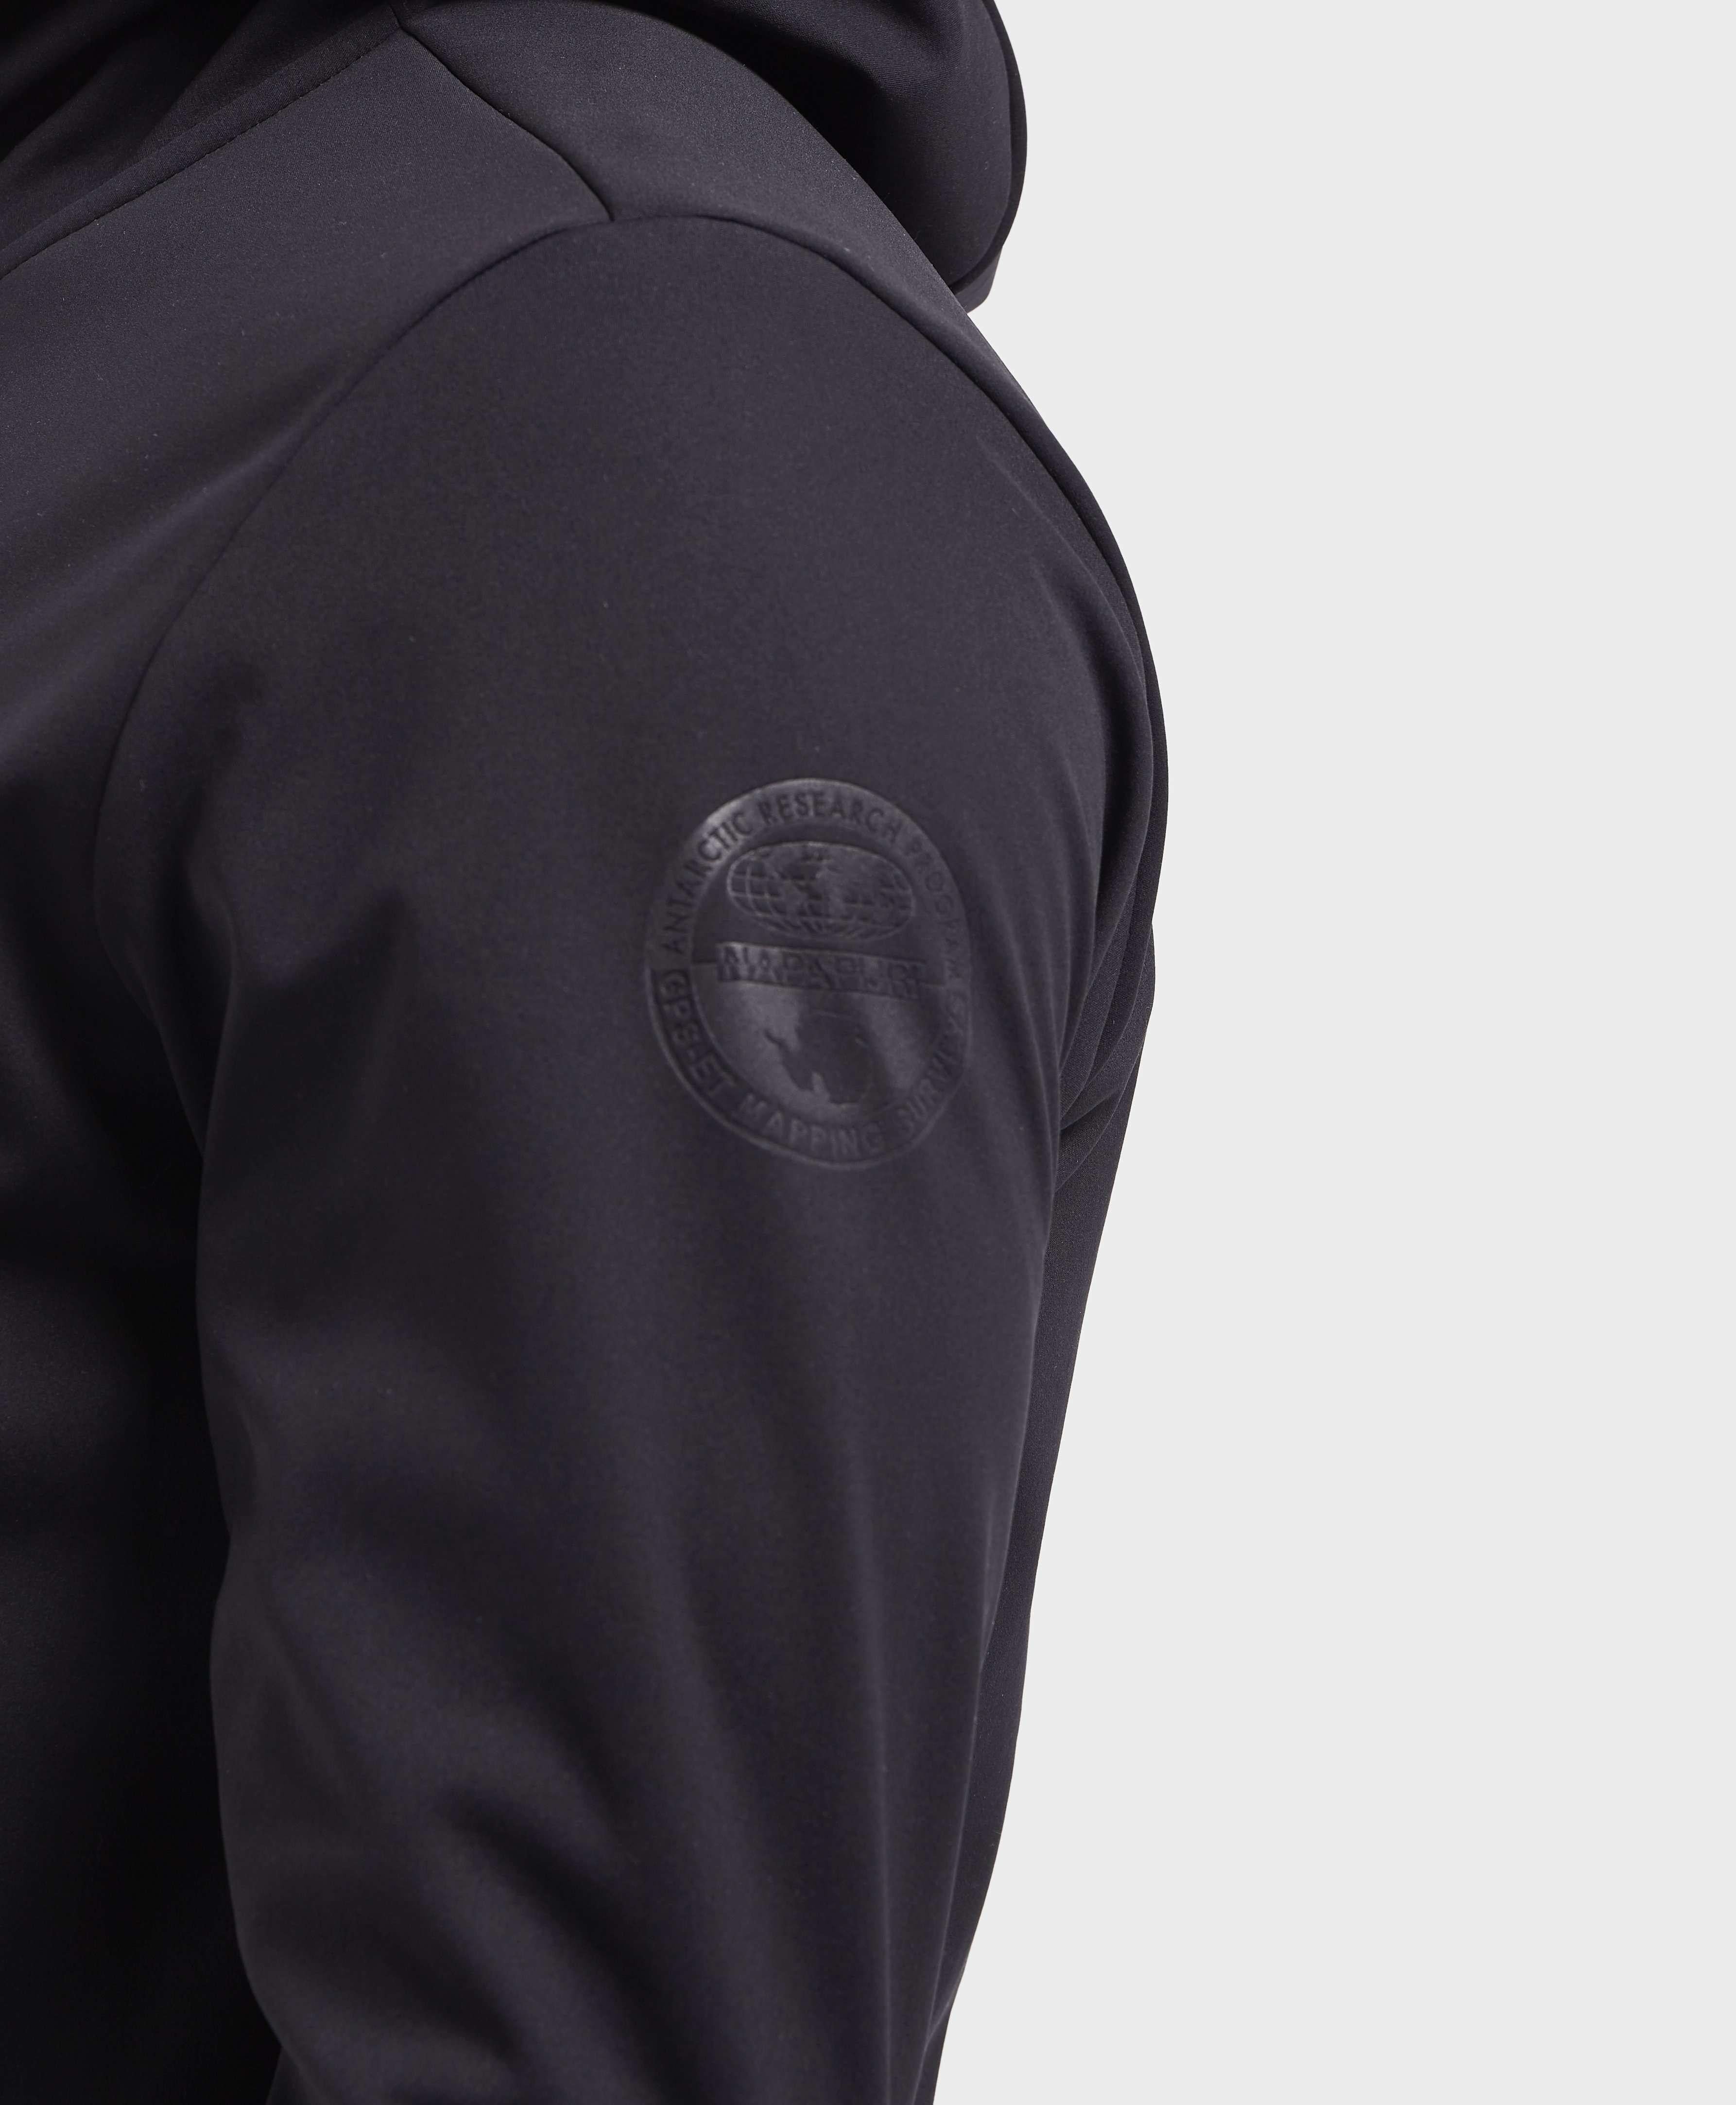 Napapijri Taden Softshell Overhead Jacket